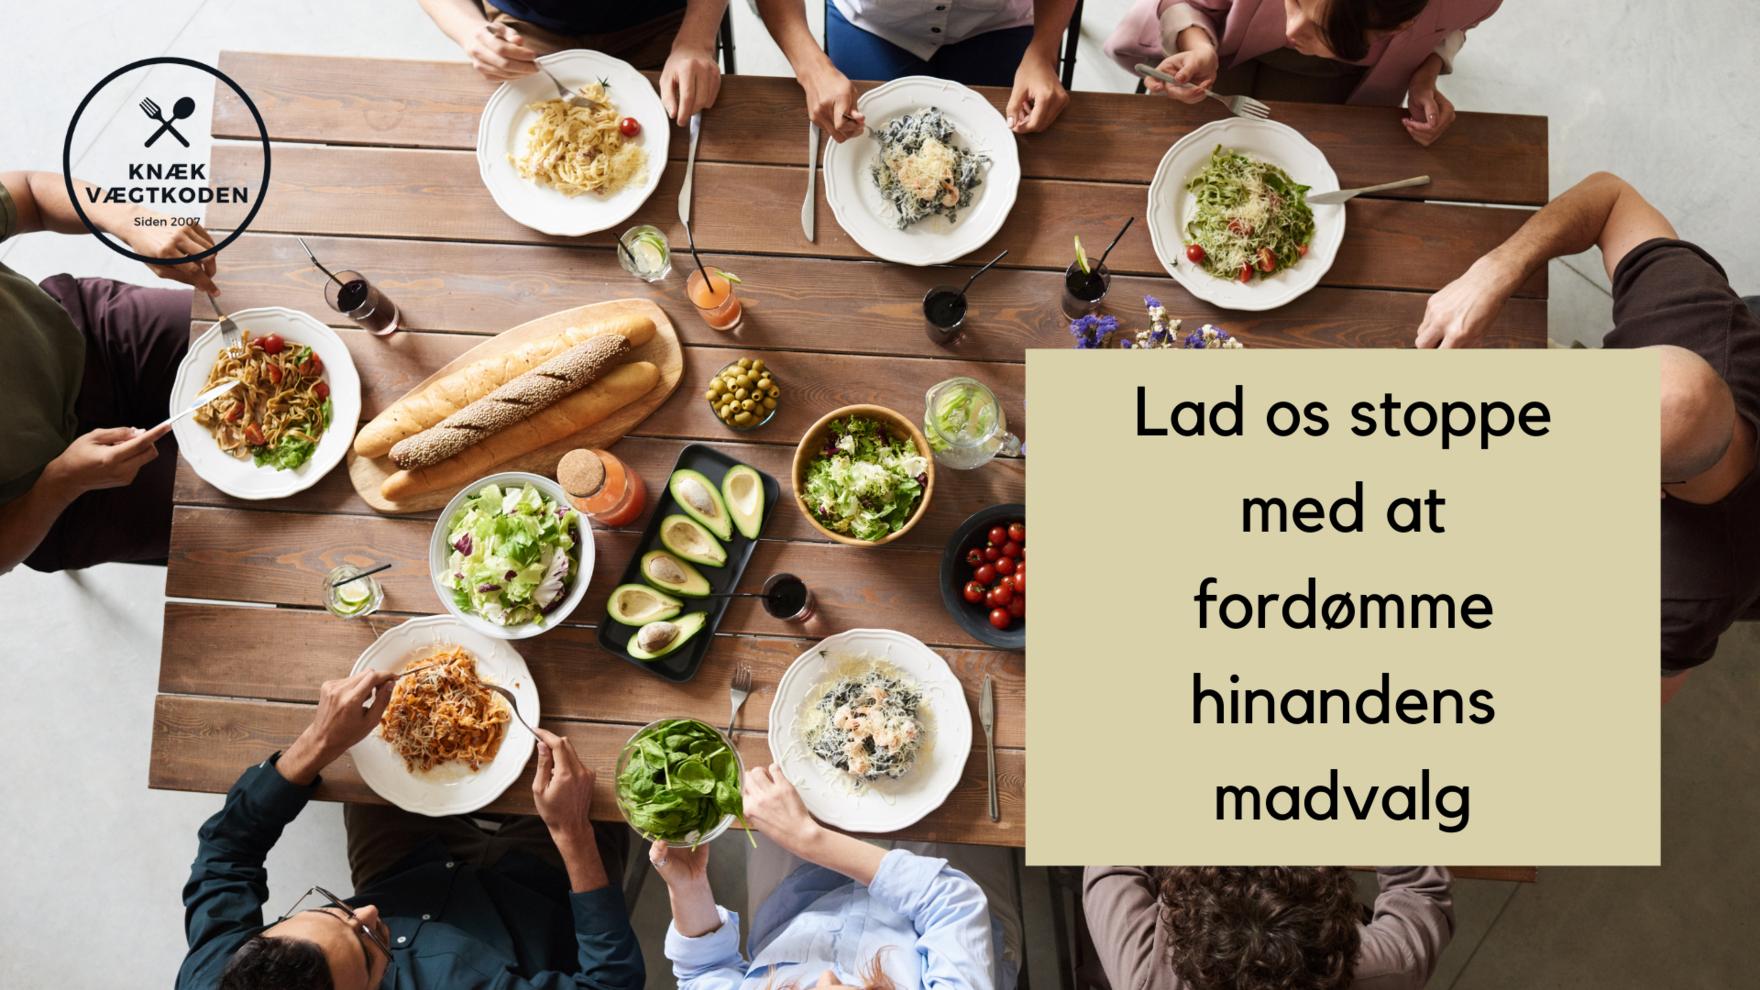 fordømme madvalg skam